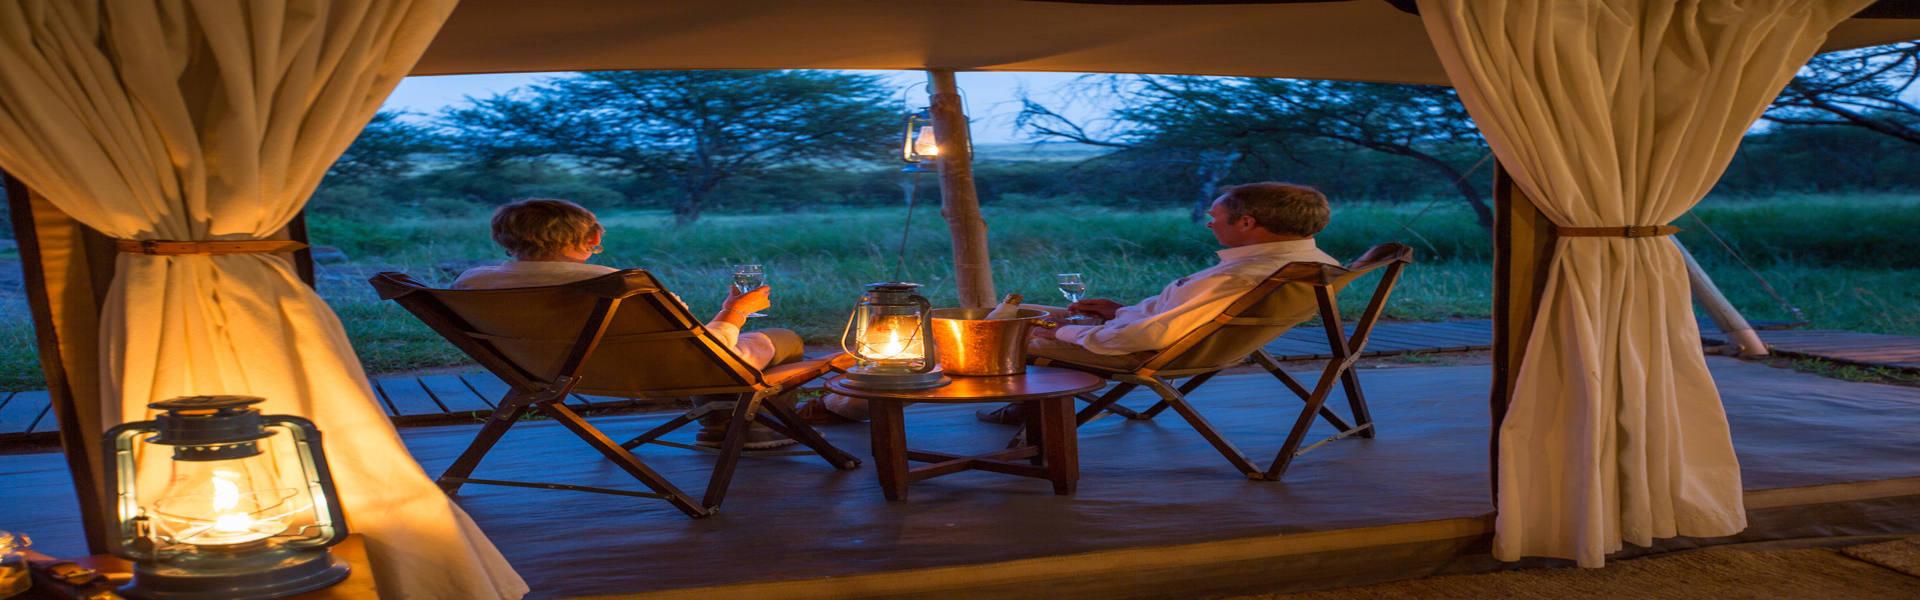 Serengeti Pioneer - Tent Verandah (c) Silverless